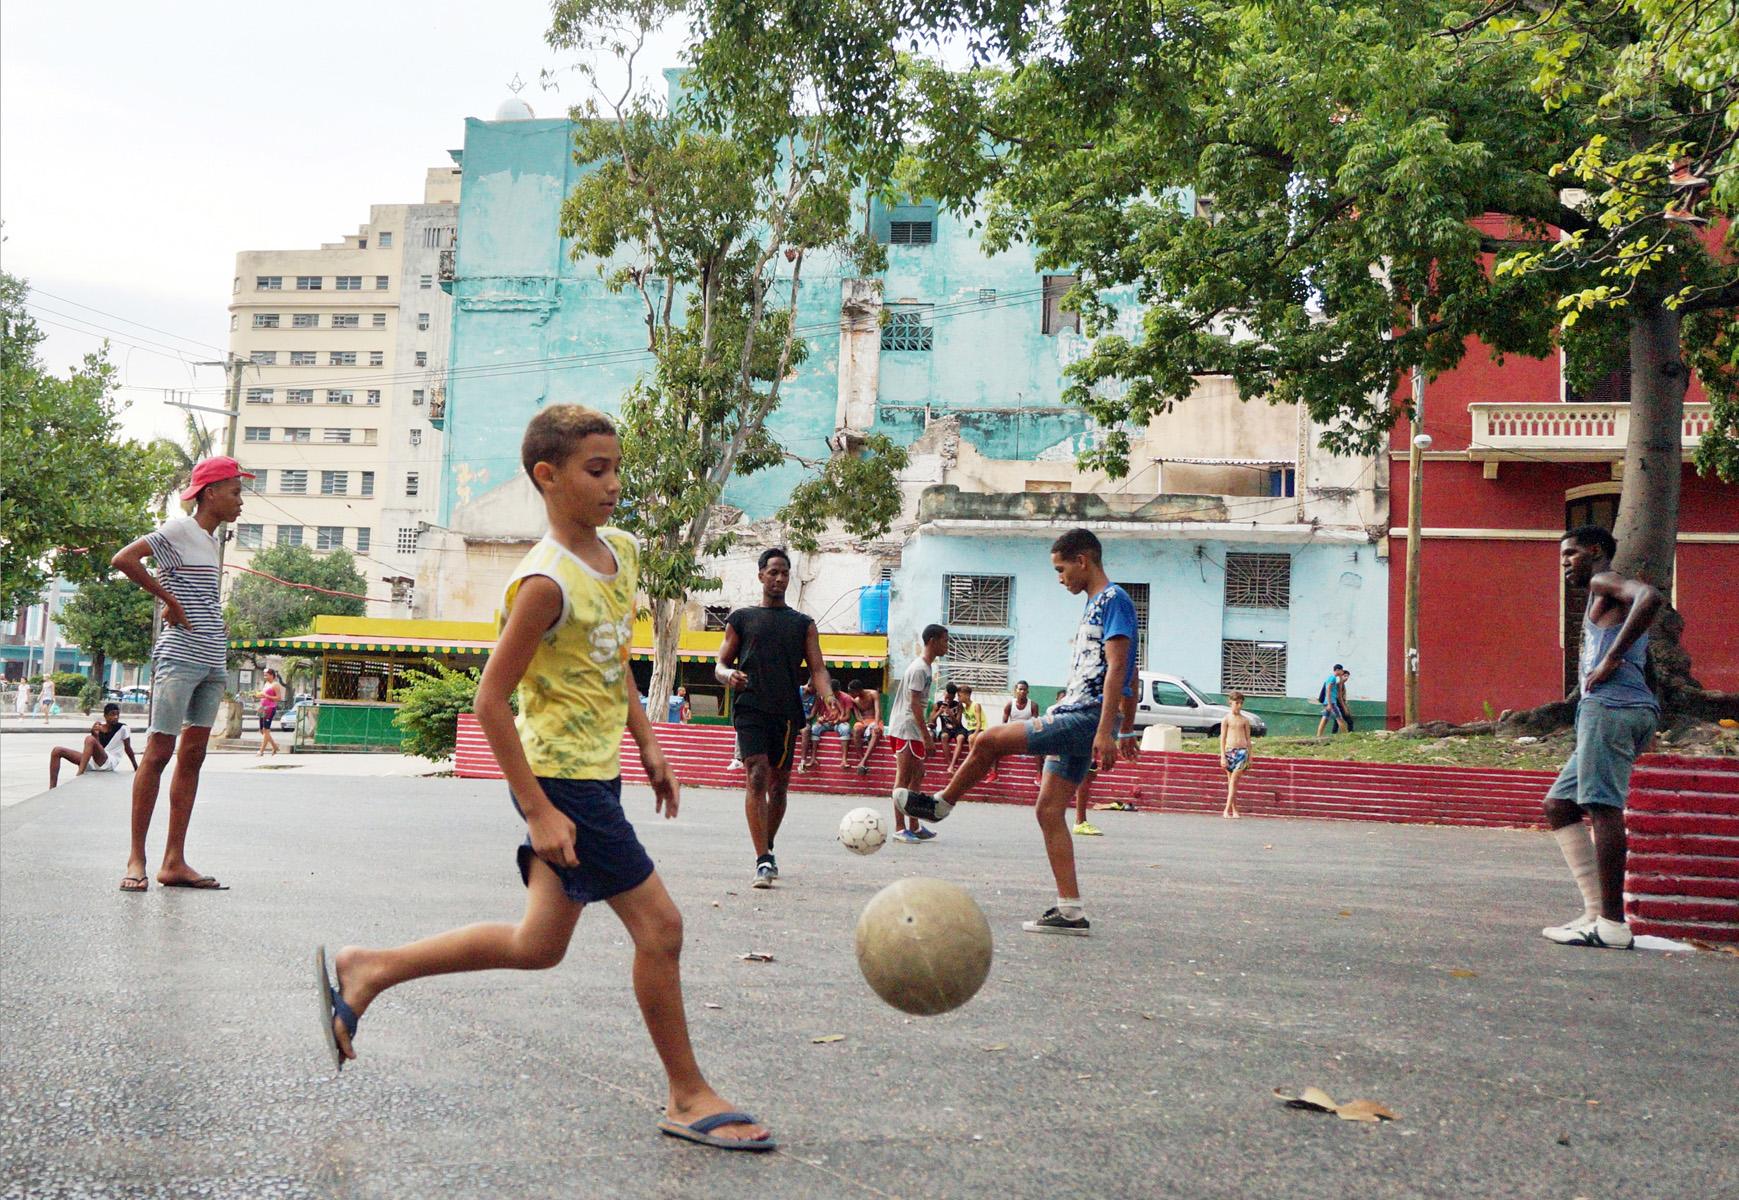 Fútbol Boys, parque en Habana Centro